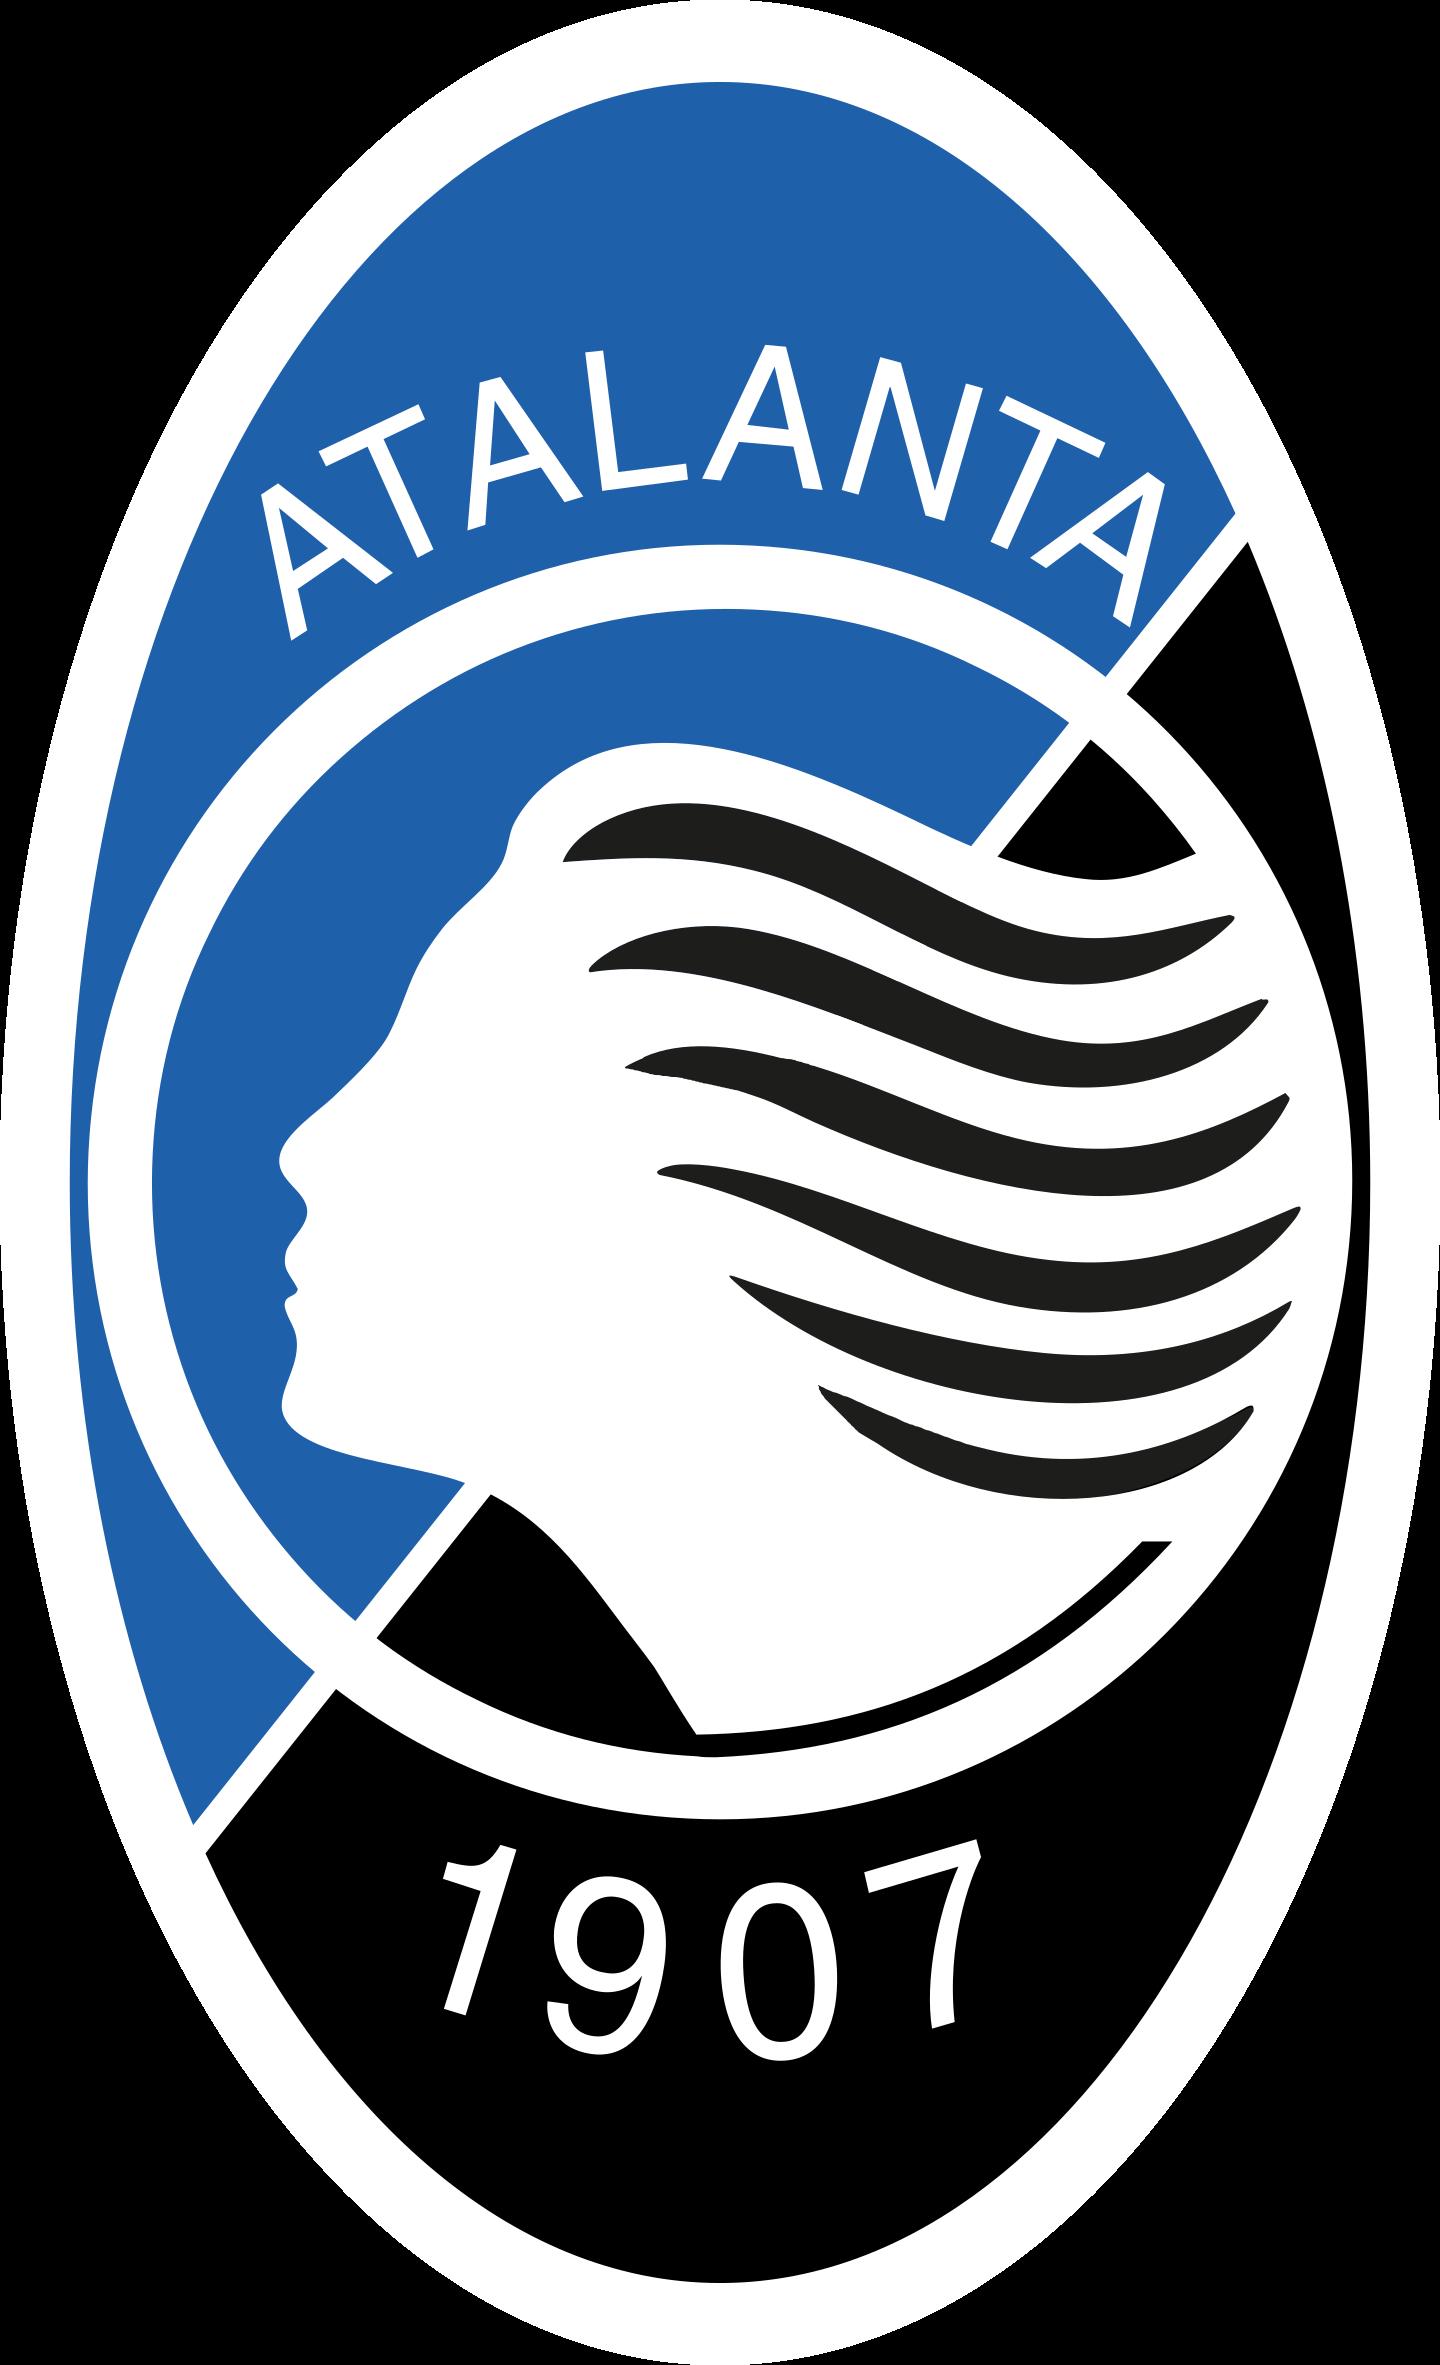 atalanta logo 2 - Atalanta BC Logo - Escudo